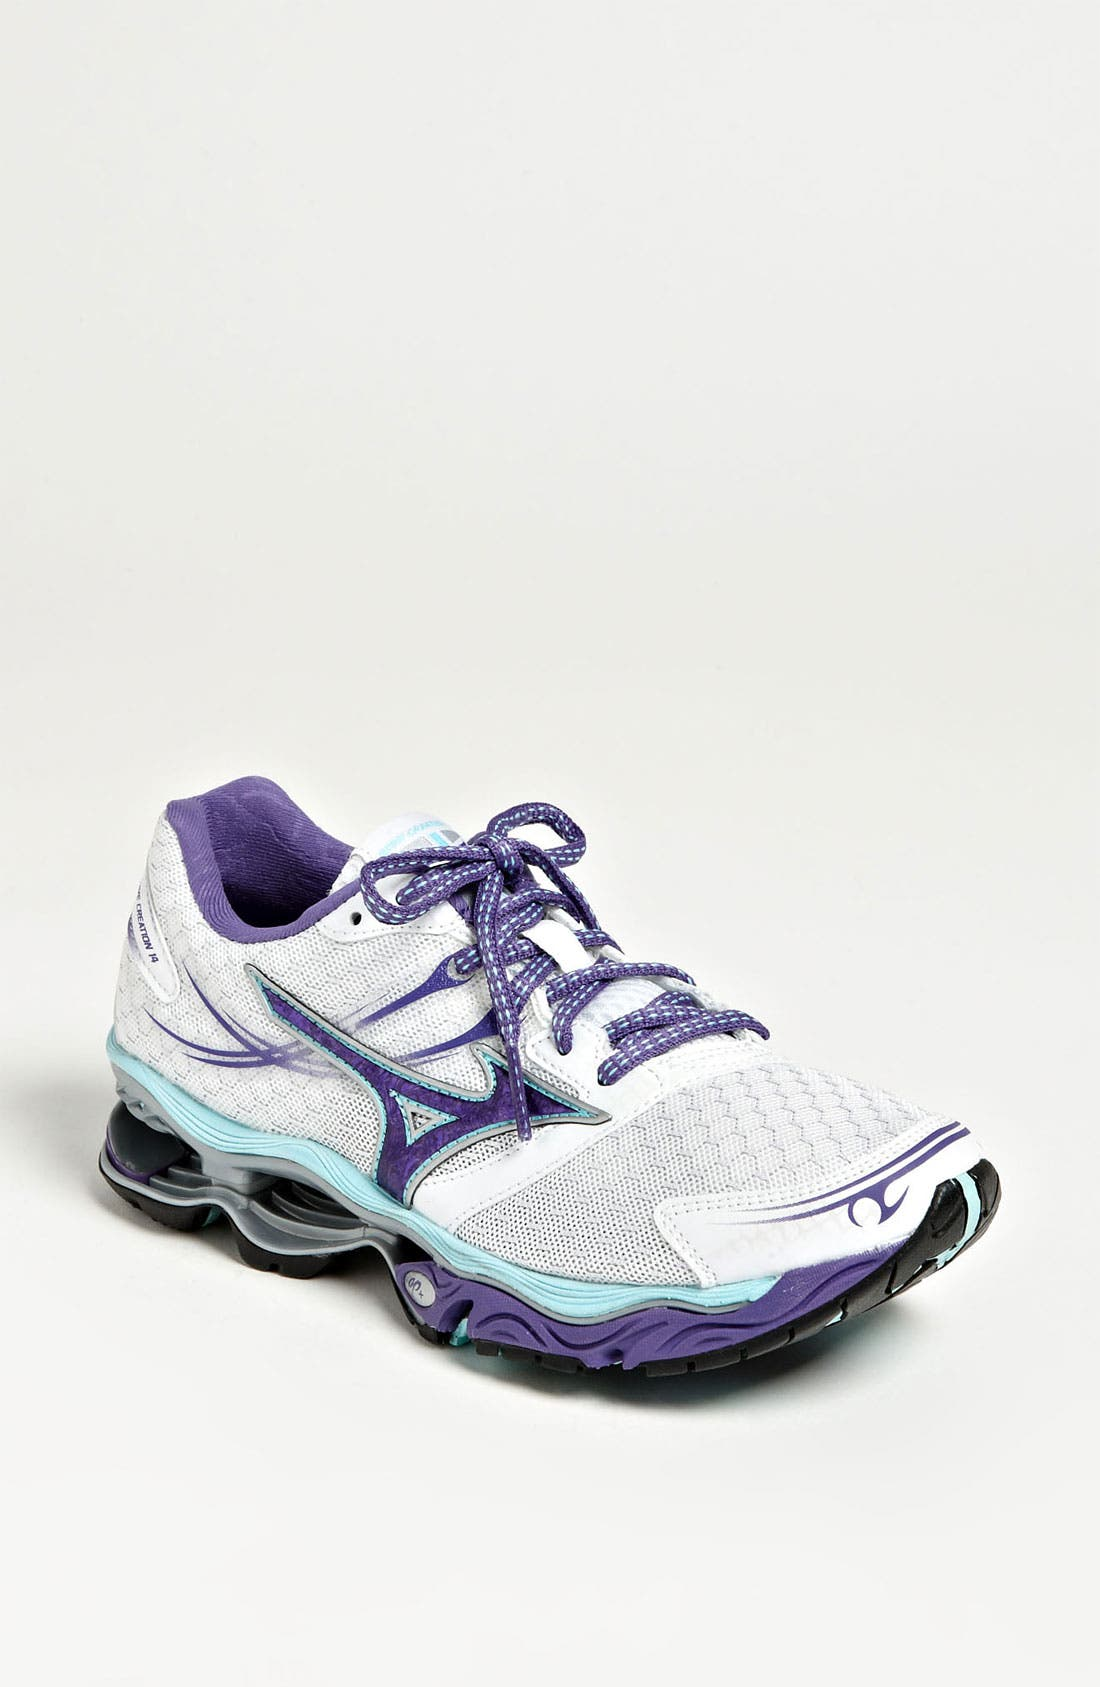 Main Image - Mizuno 'Wave Creation 14' Running Shoe (Women)(Retail Price: $149.95)